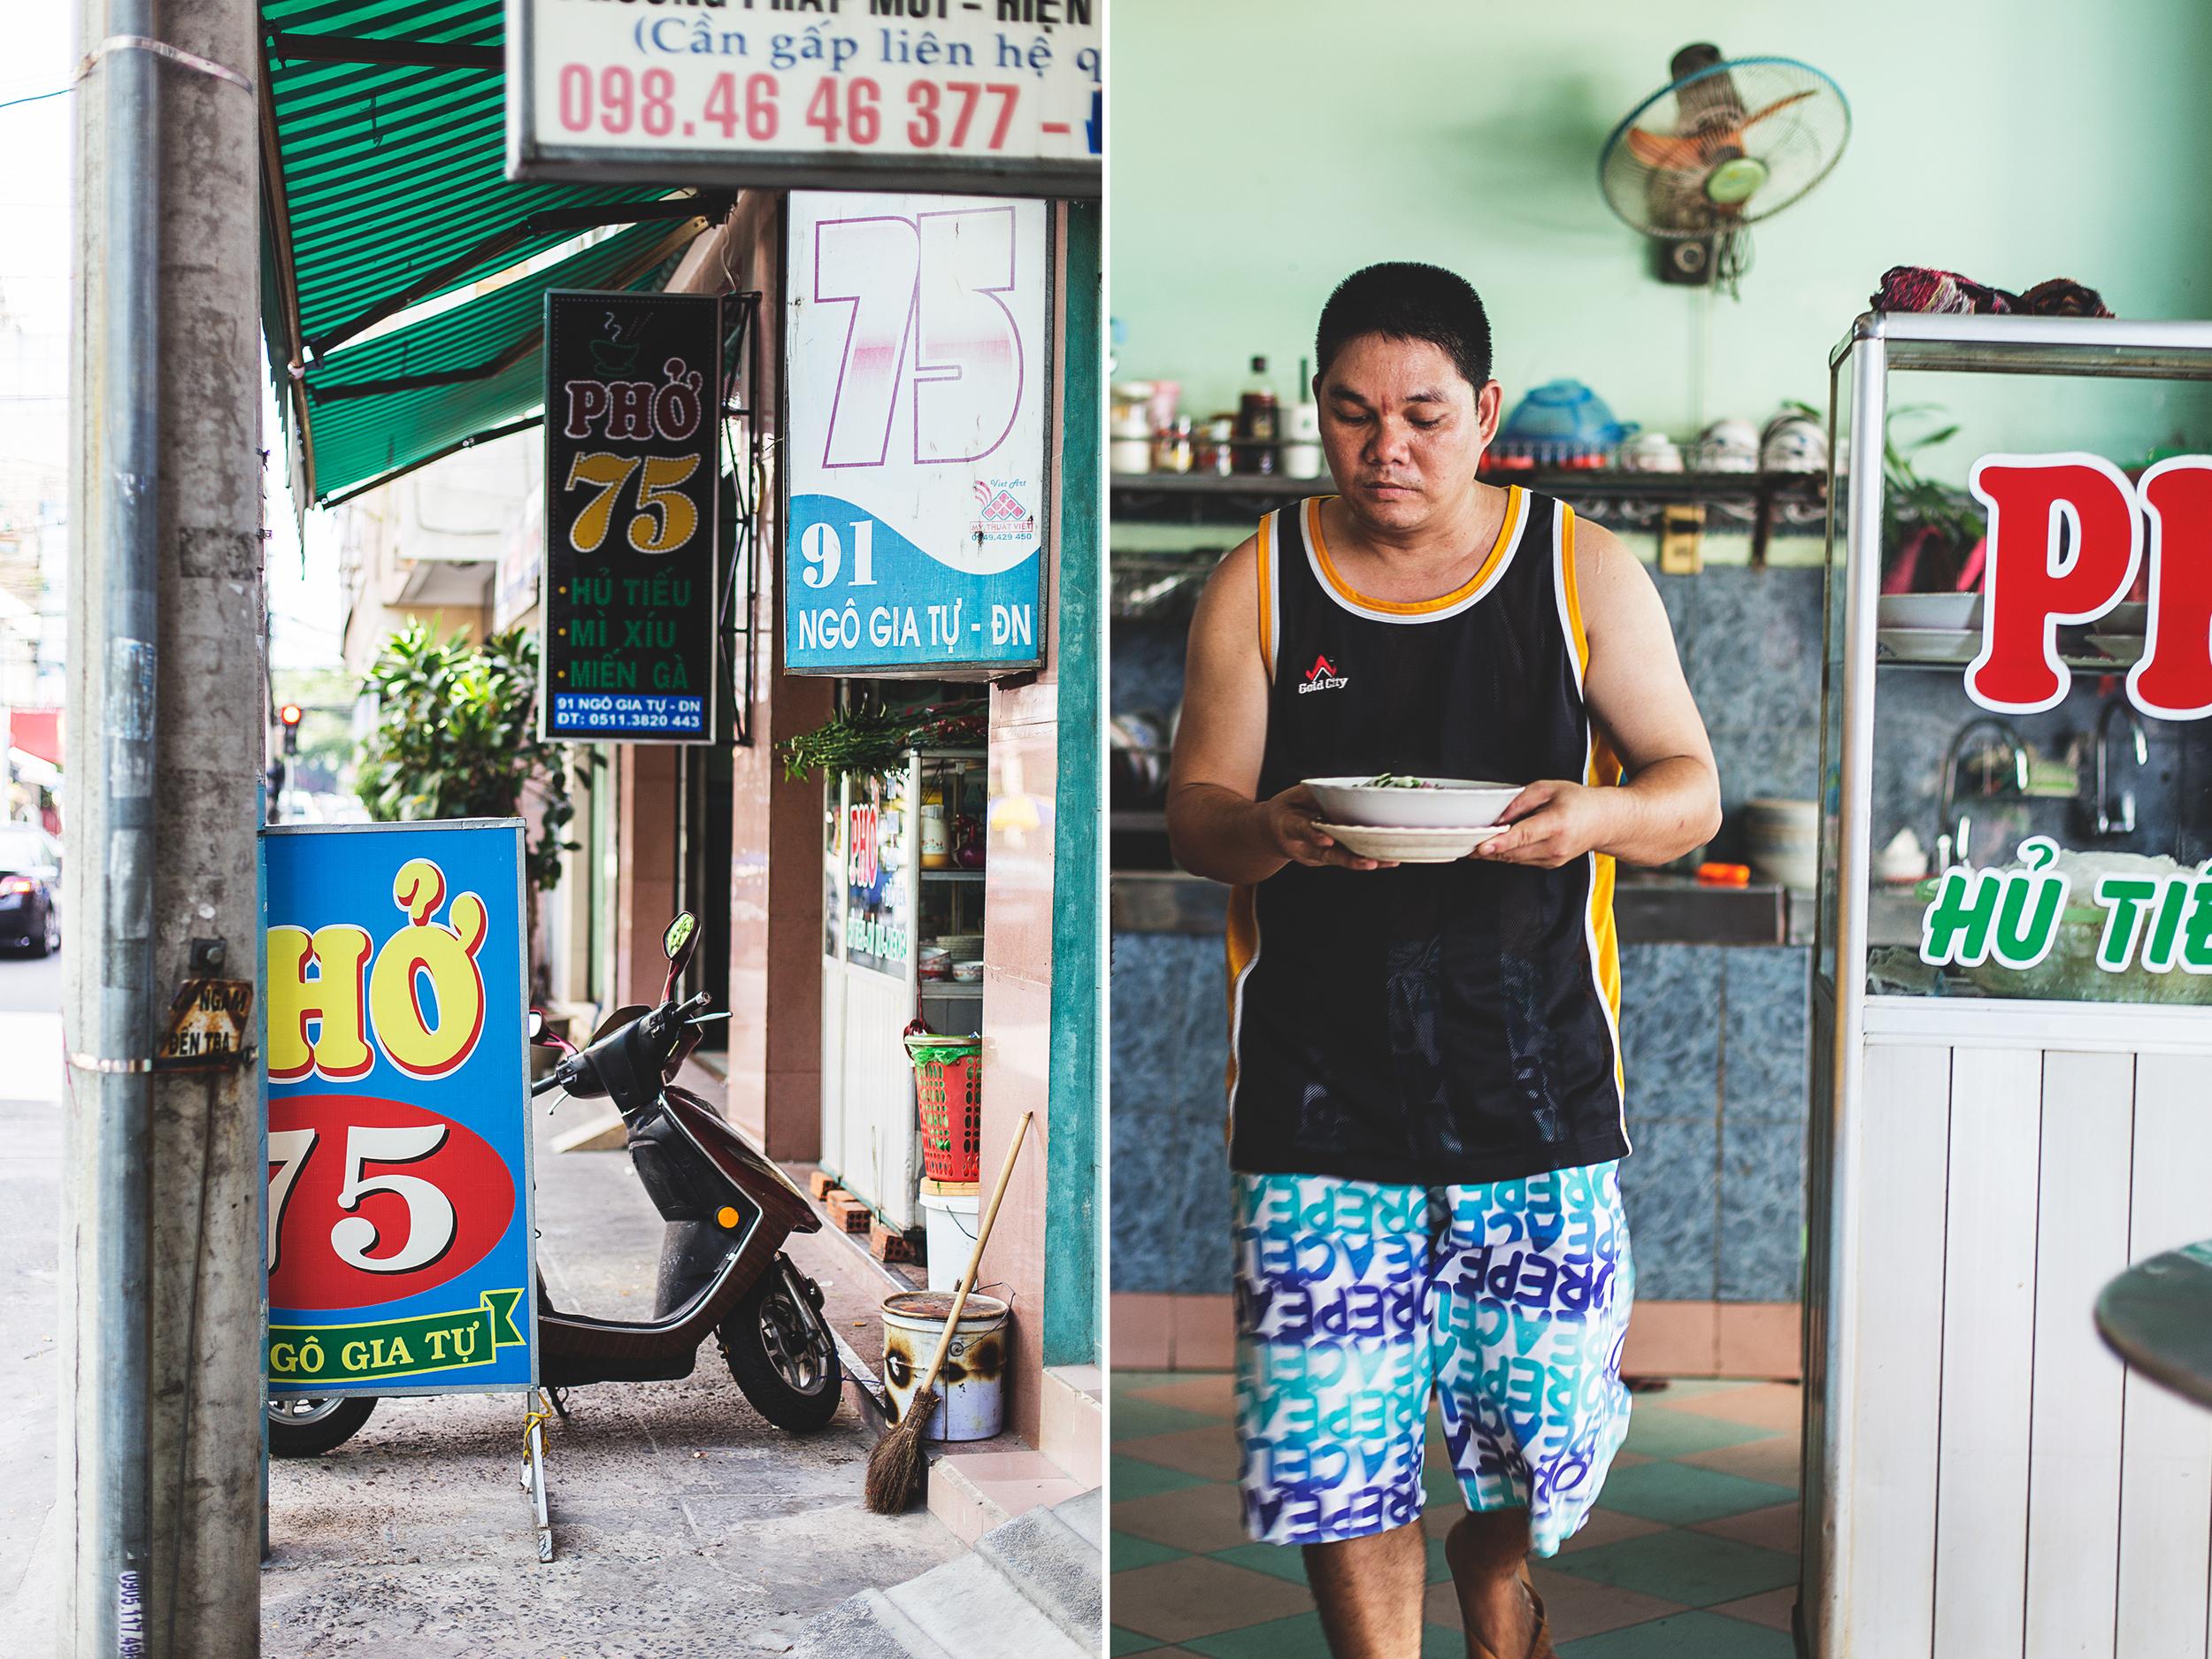 20140826-danang-vietnam-pho752-brian-oh.jpg